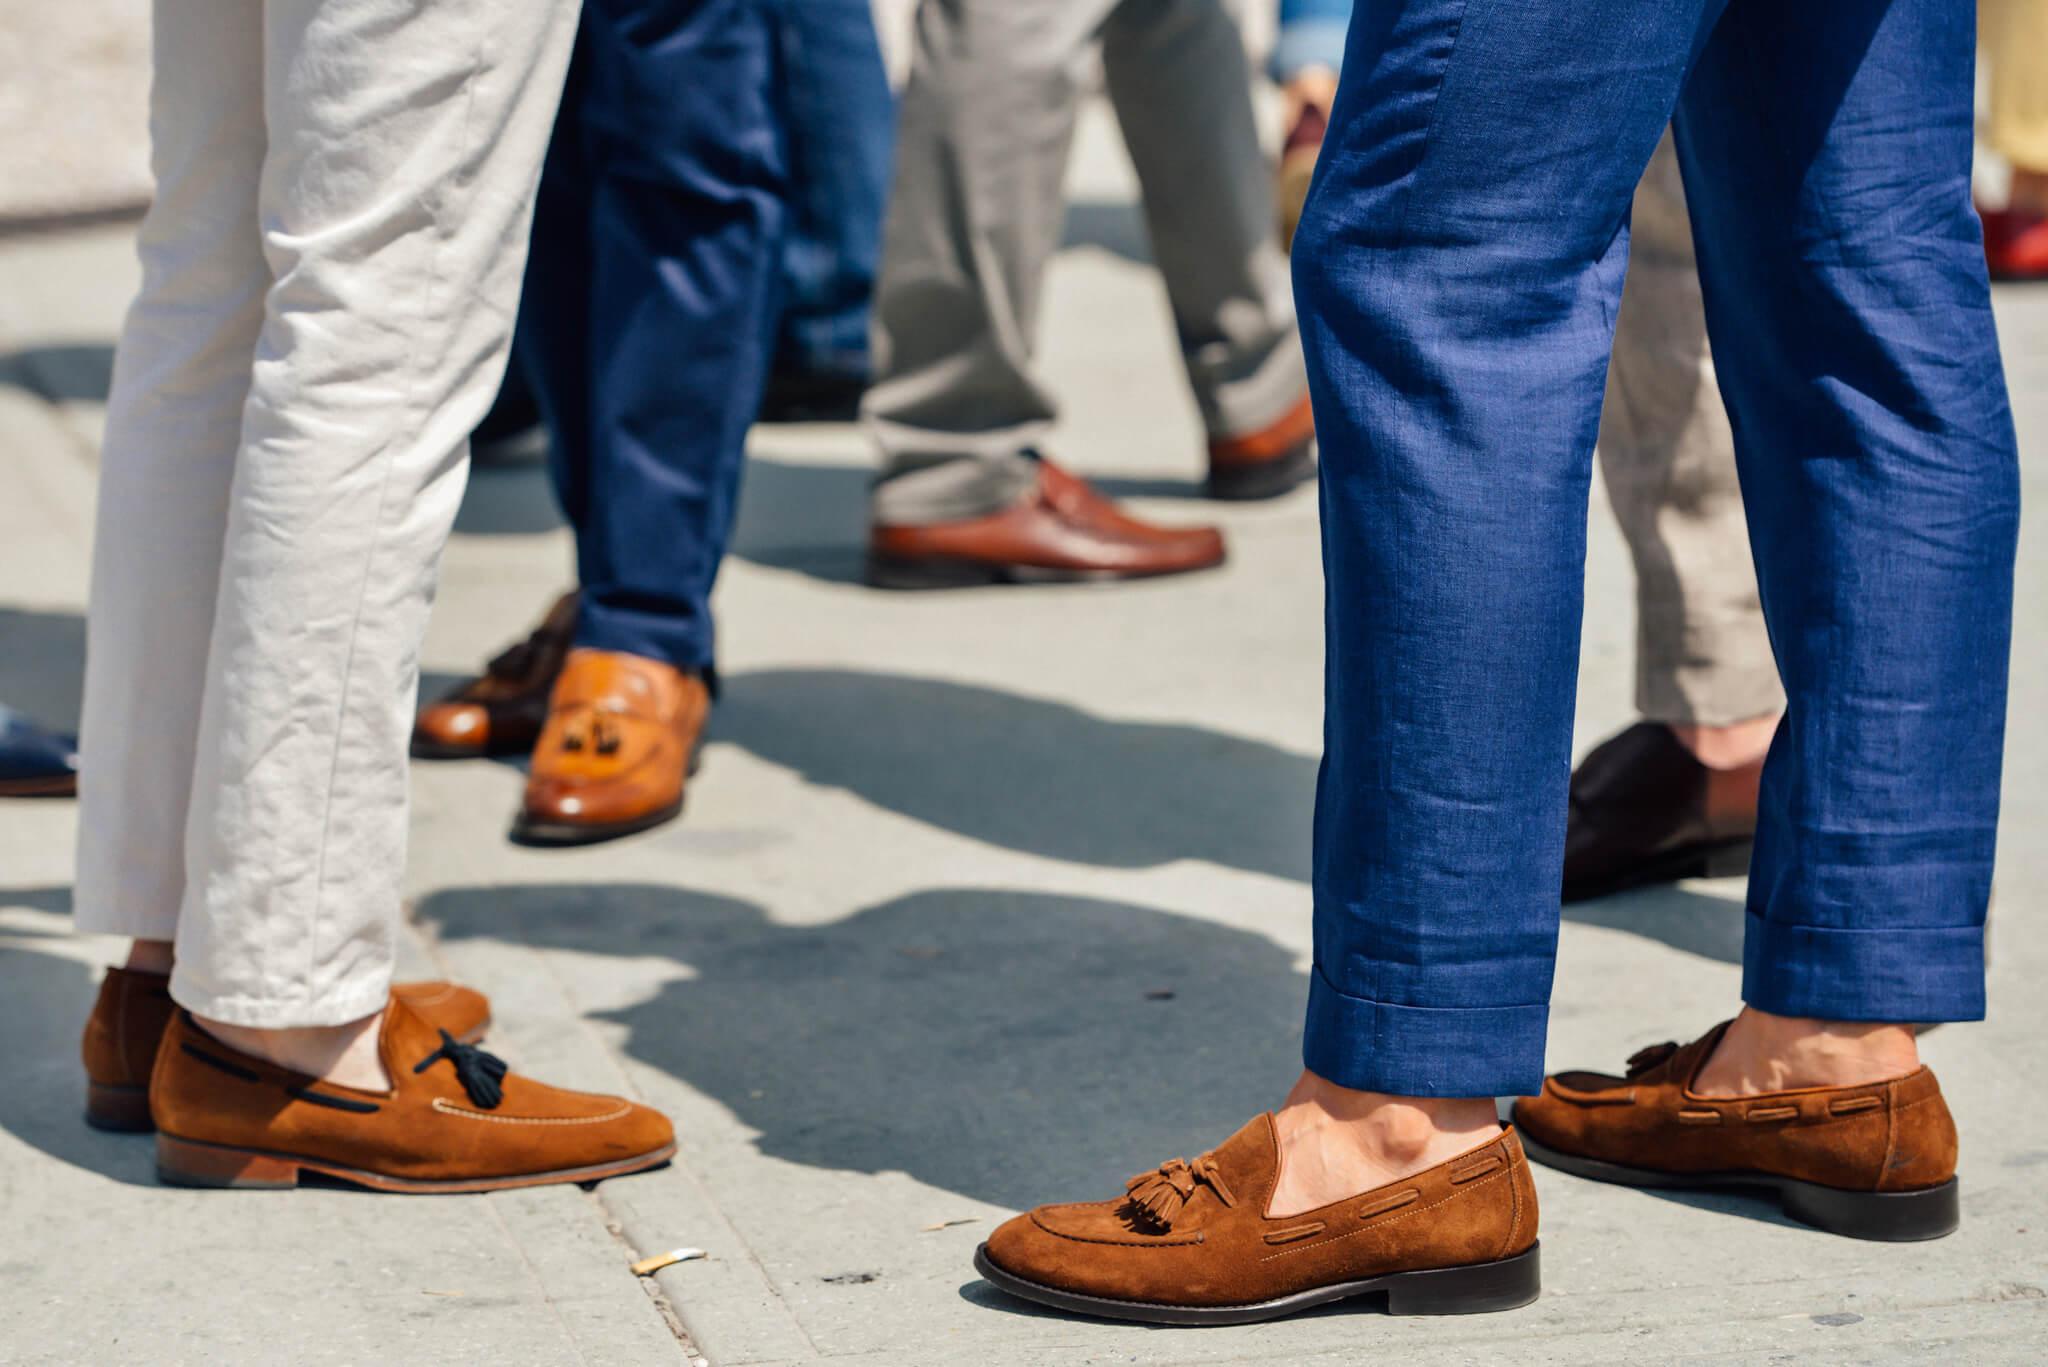 Cum alegeti o pereche de pantaloni pentru barbati?